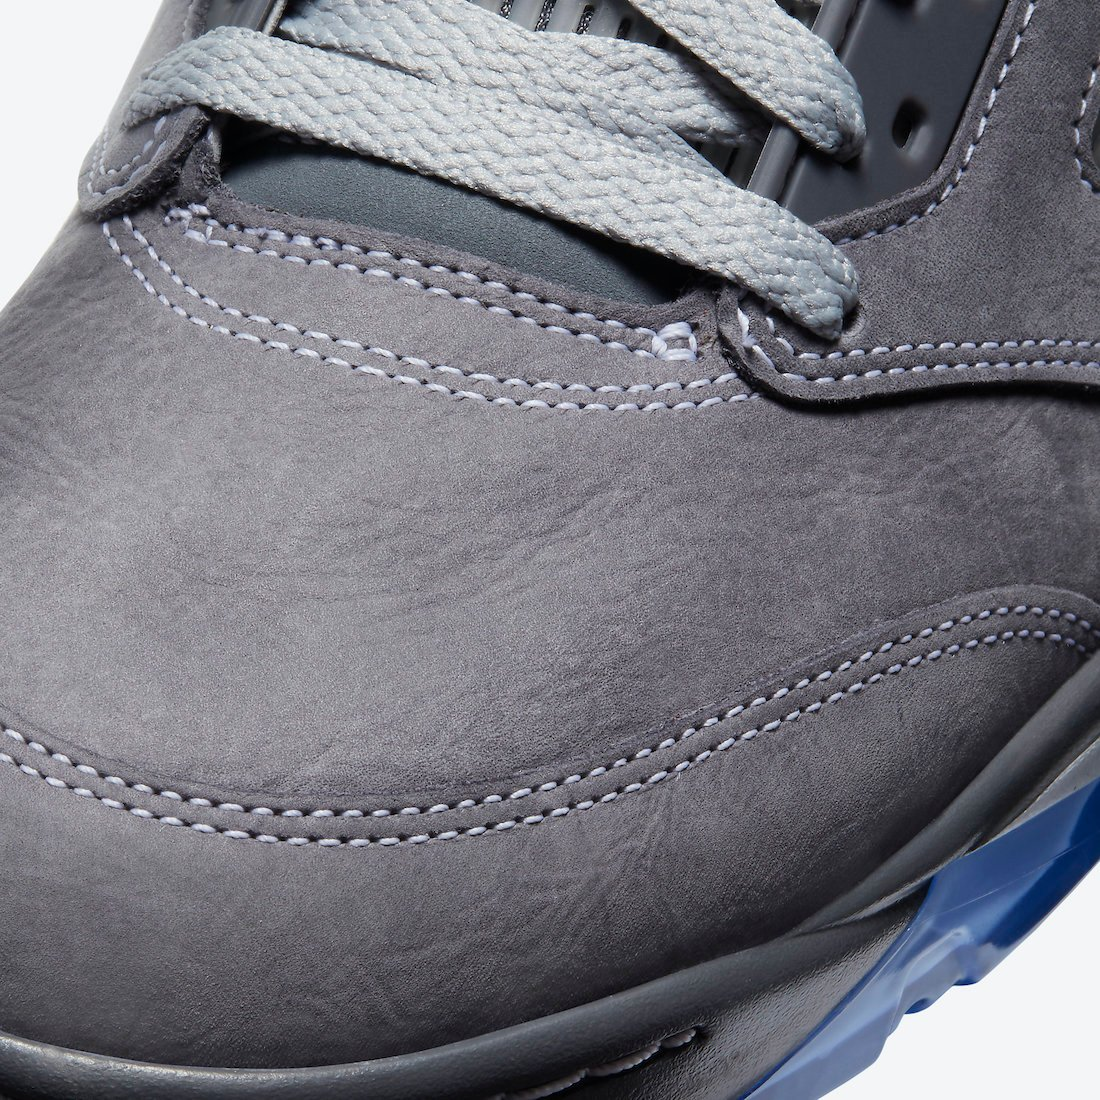 Air Jordan 5 Low Golf Wolf Grey CU4523-005 Release Date Info